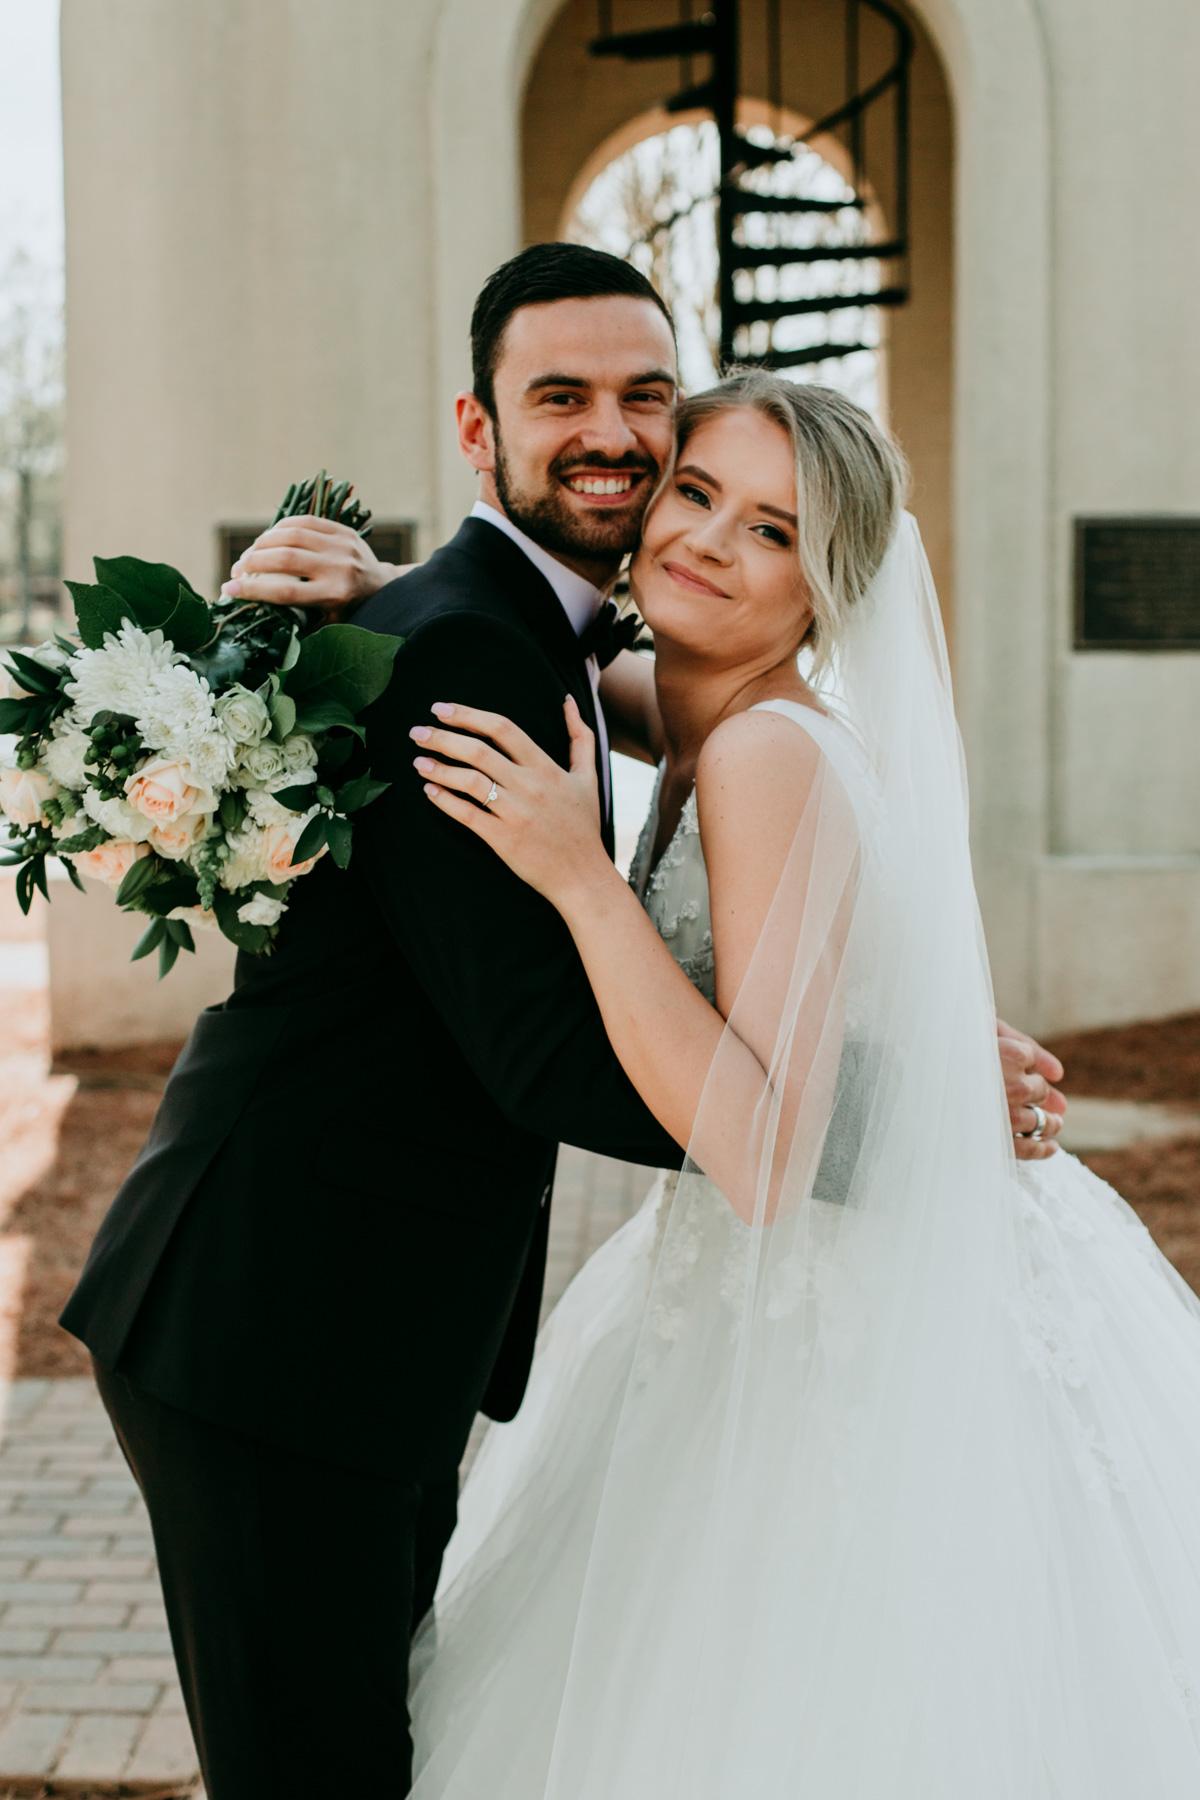 fun-wedding-photo-ideas.jpg